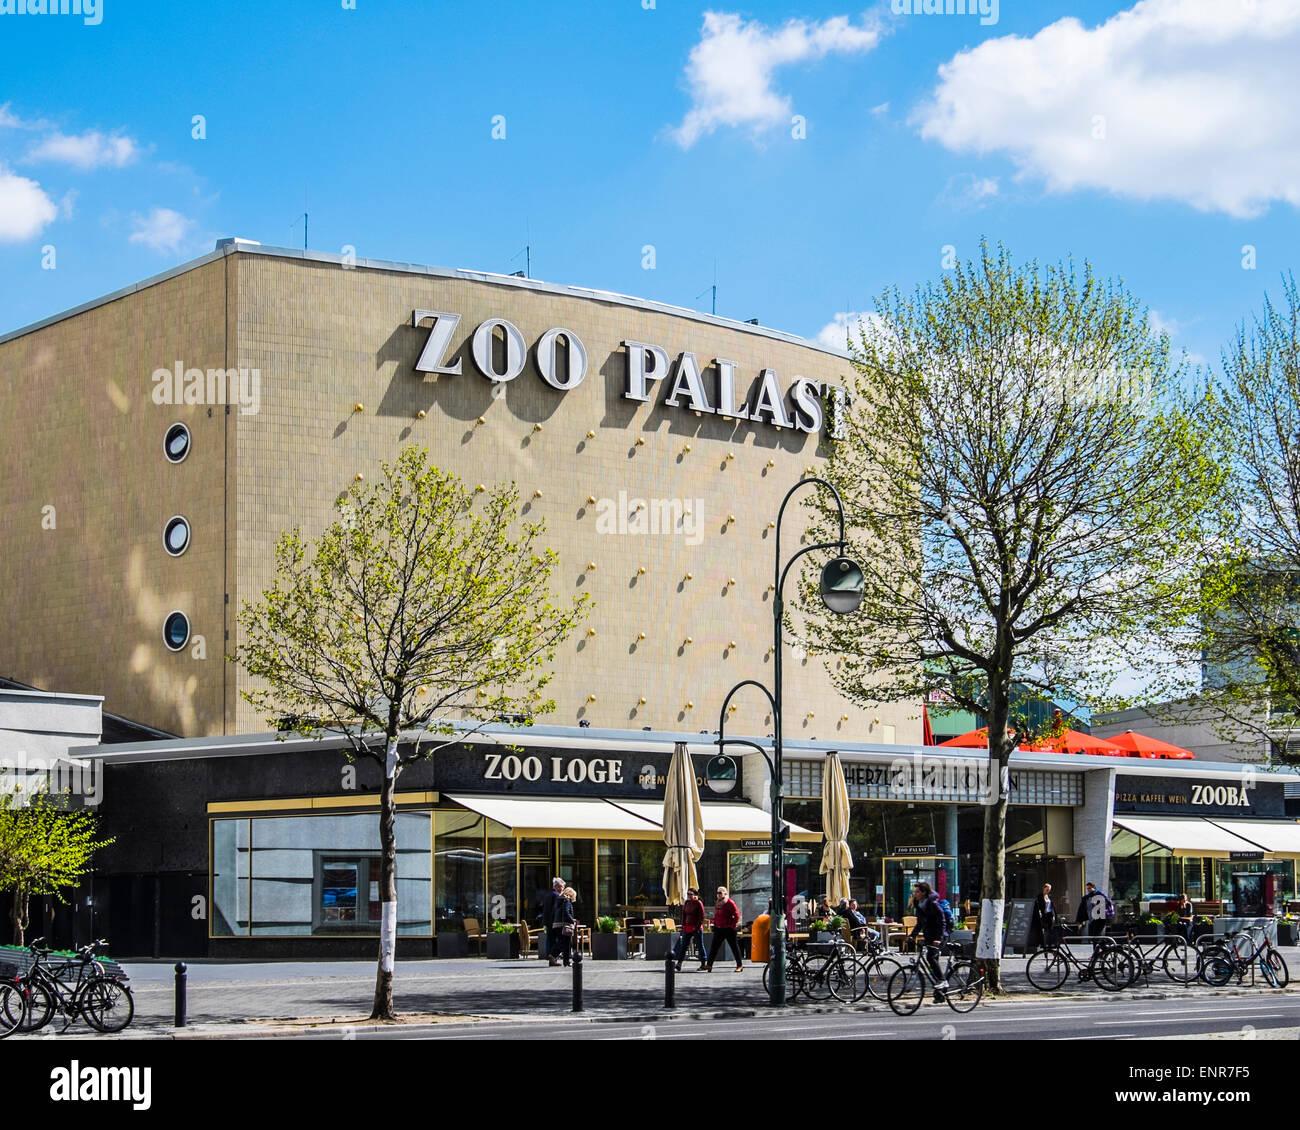 Berlin Zoo Palast exterior , cinema refurbished theatre retains elegant 1950s style in Hardenbergstrasse - Stock Image